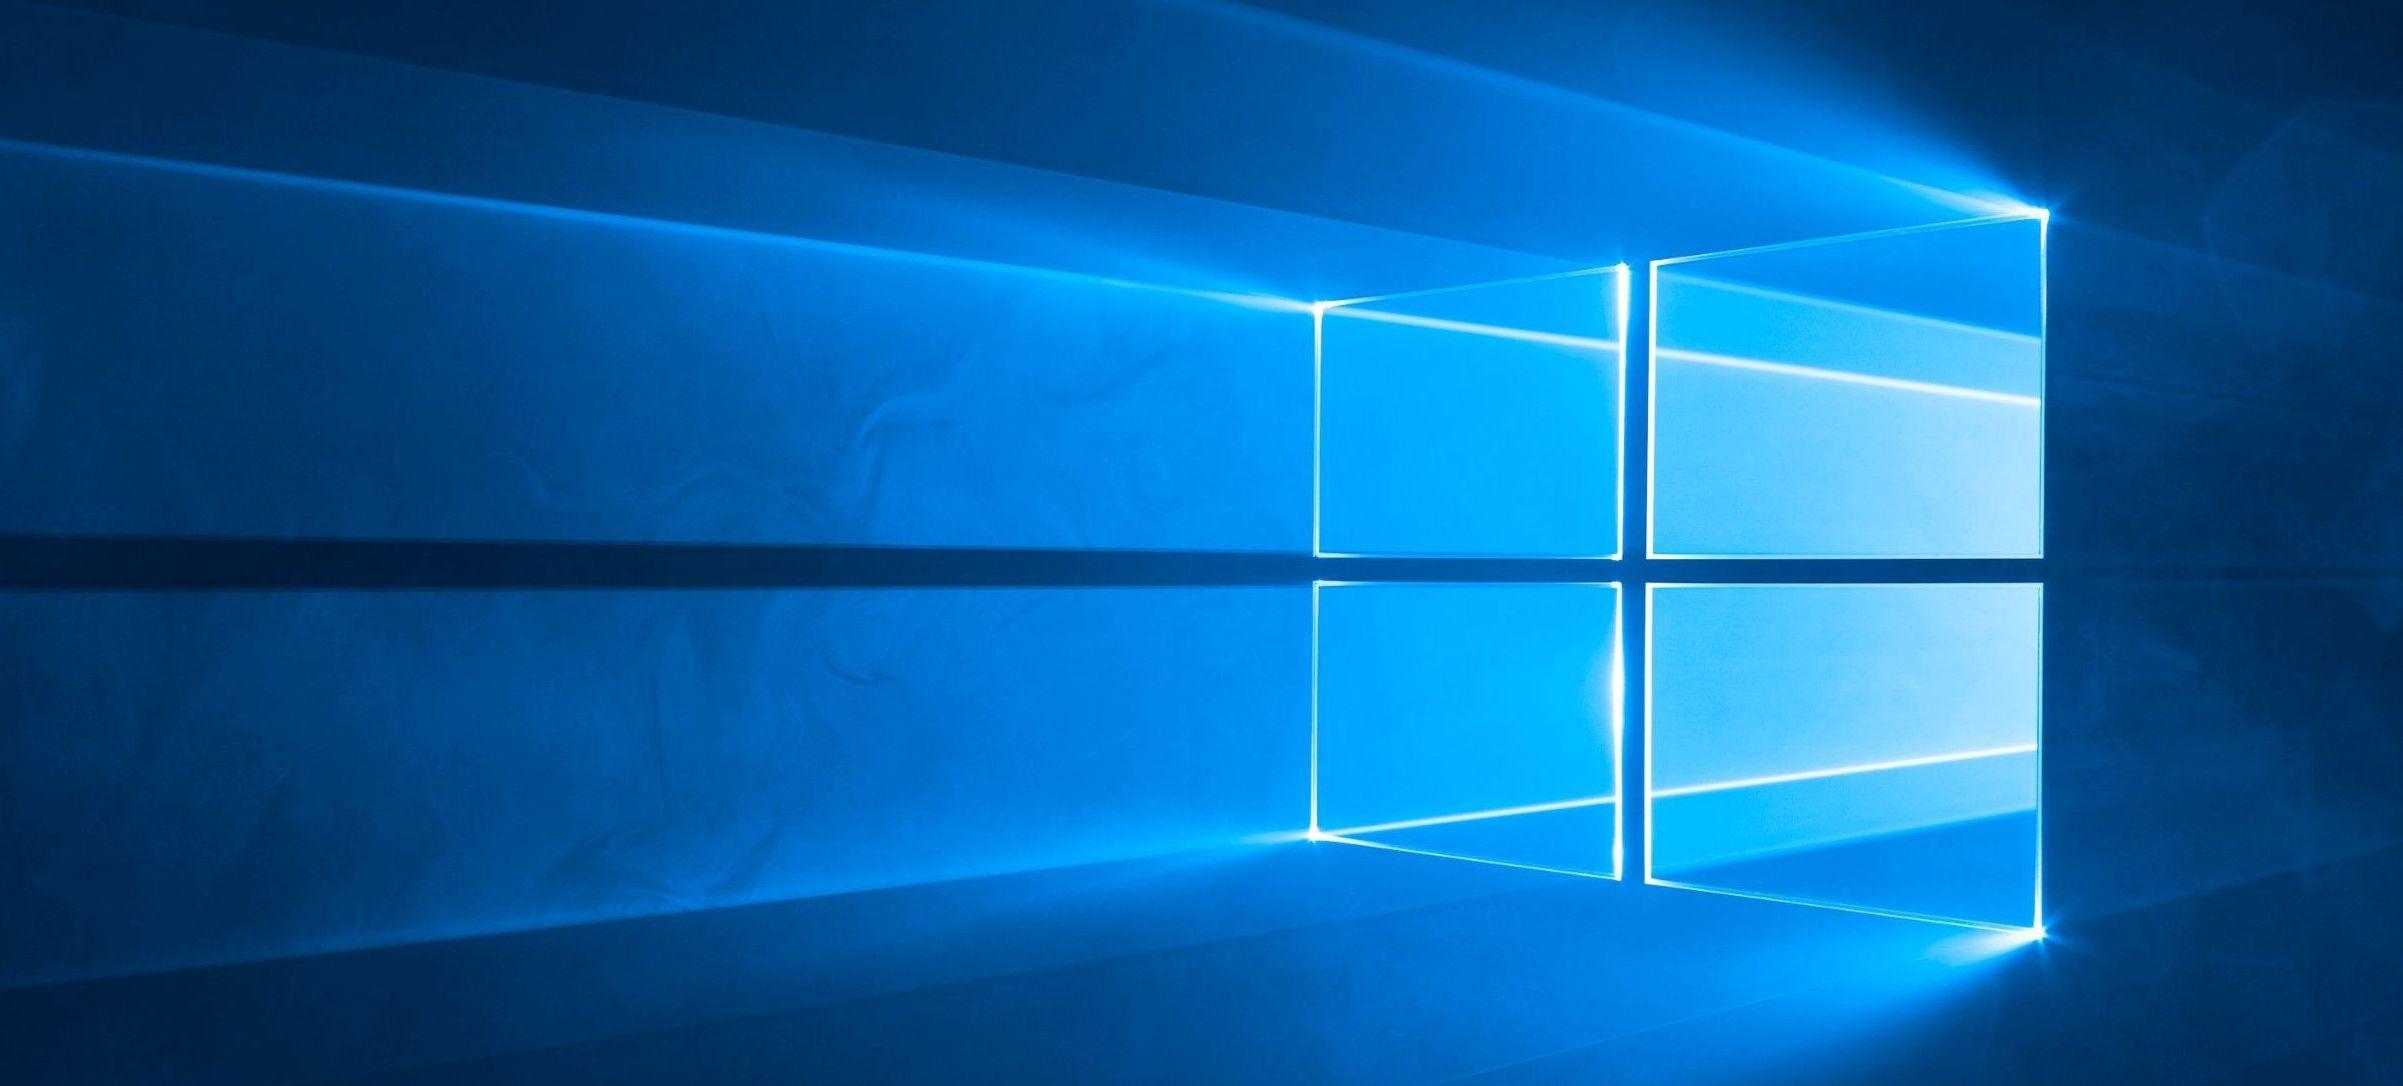 Windows-10-TH2.jpg